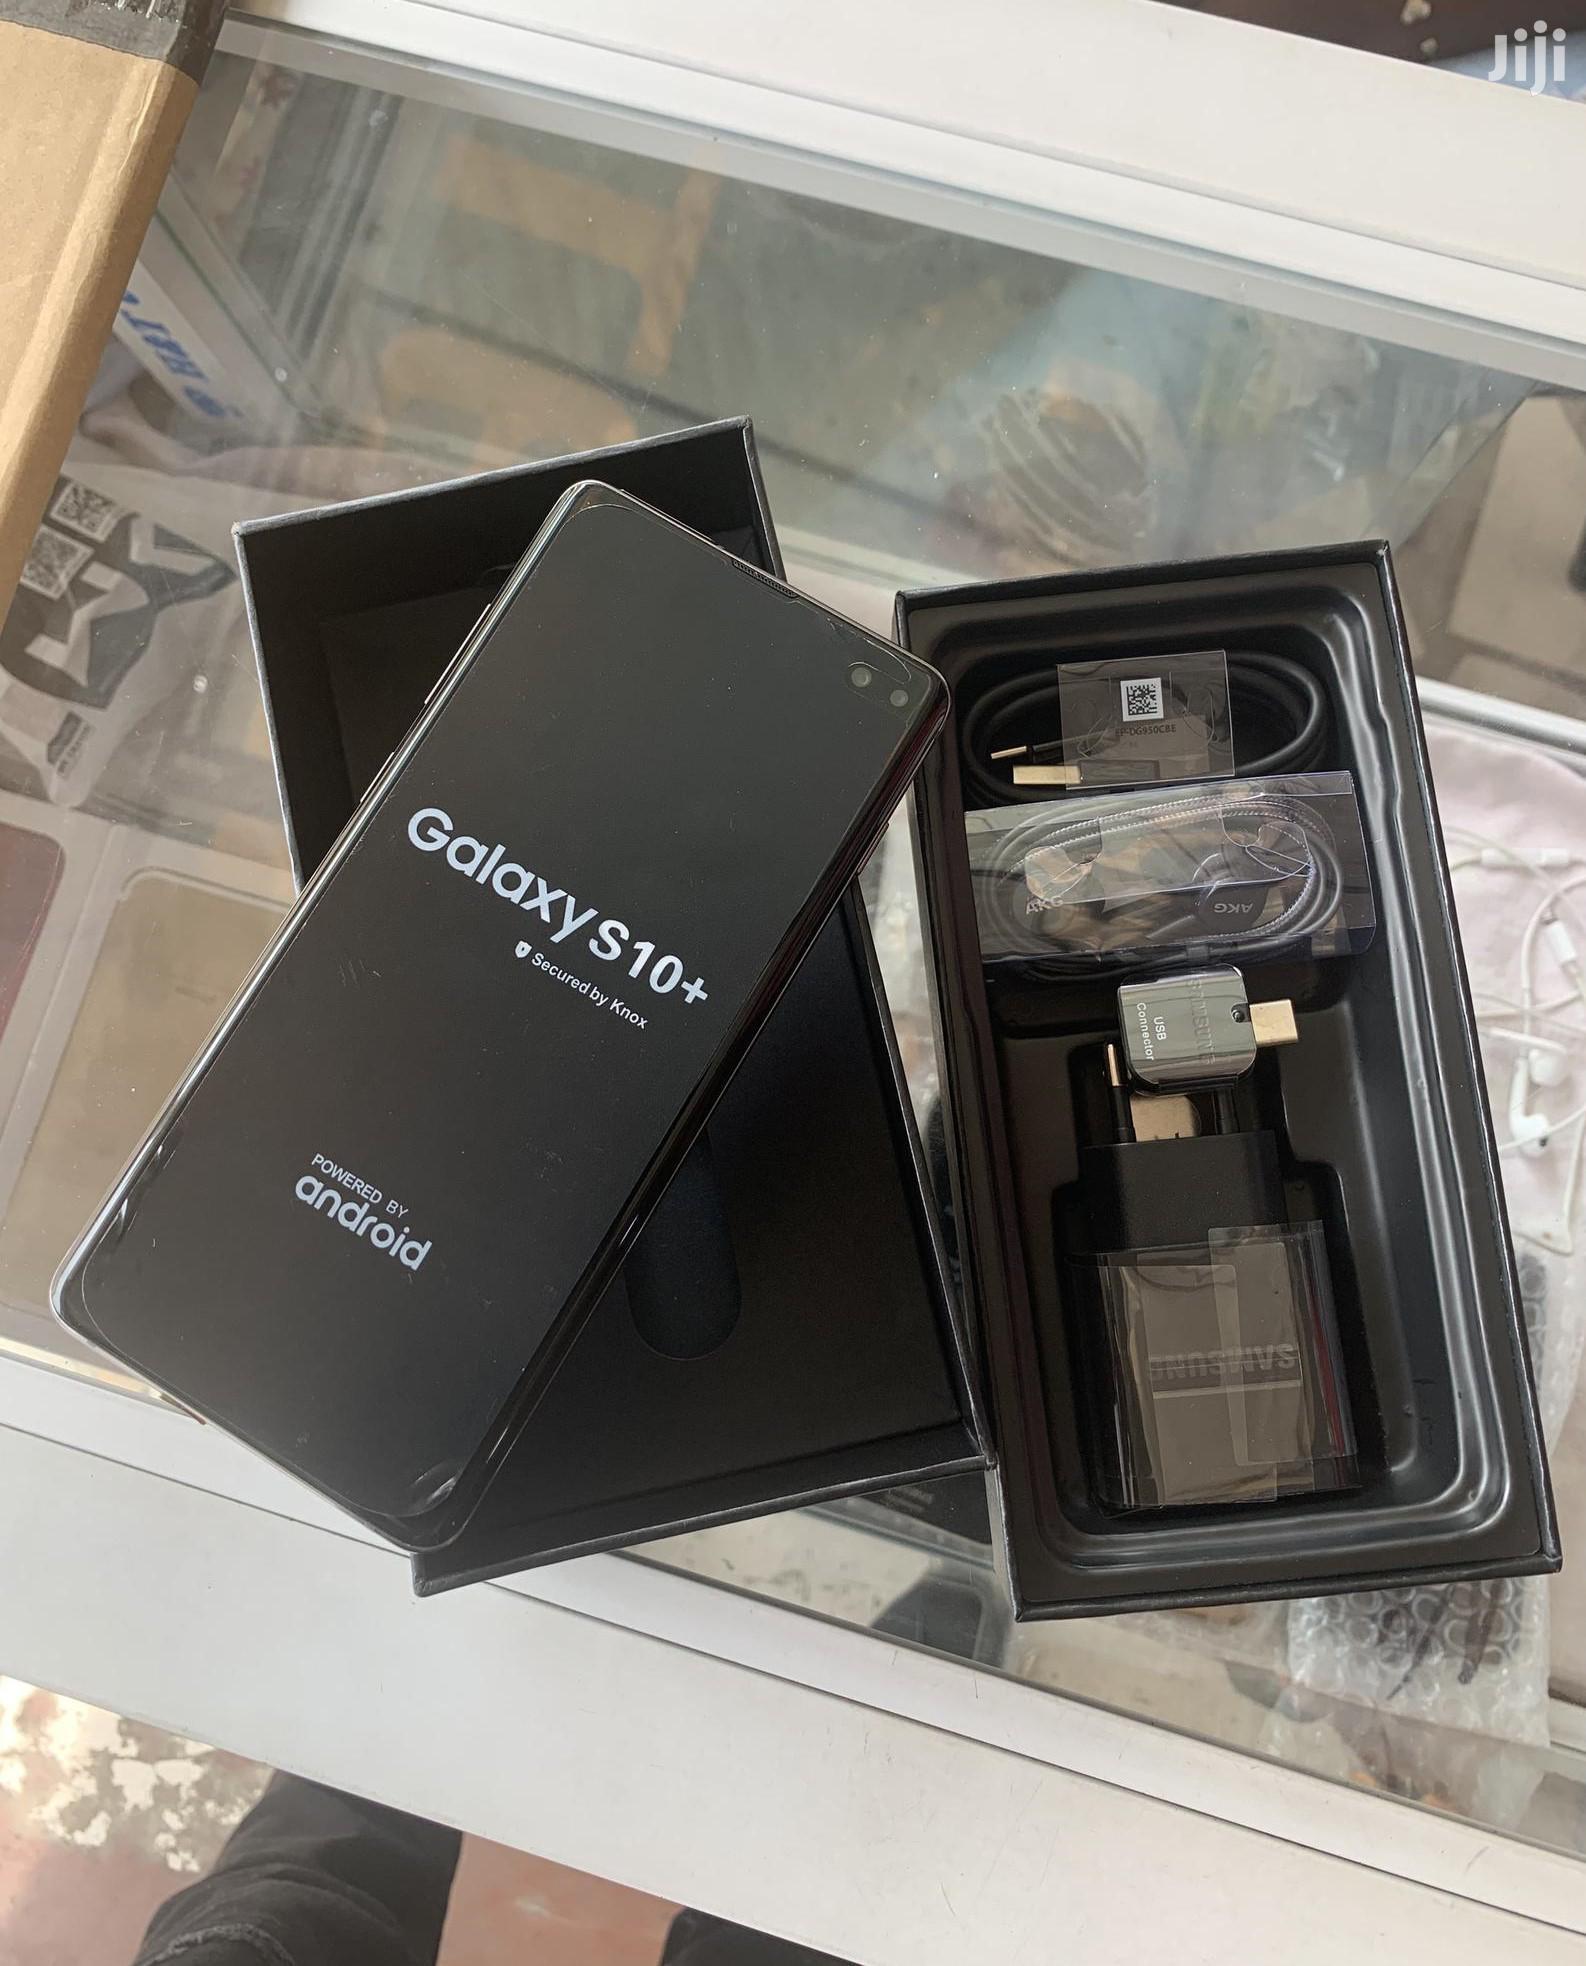 New Samsung Galaxy S10 Plus 128 GB Black